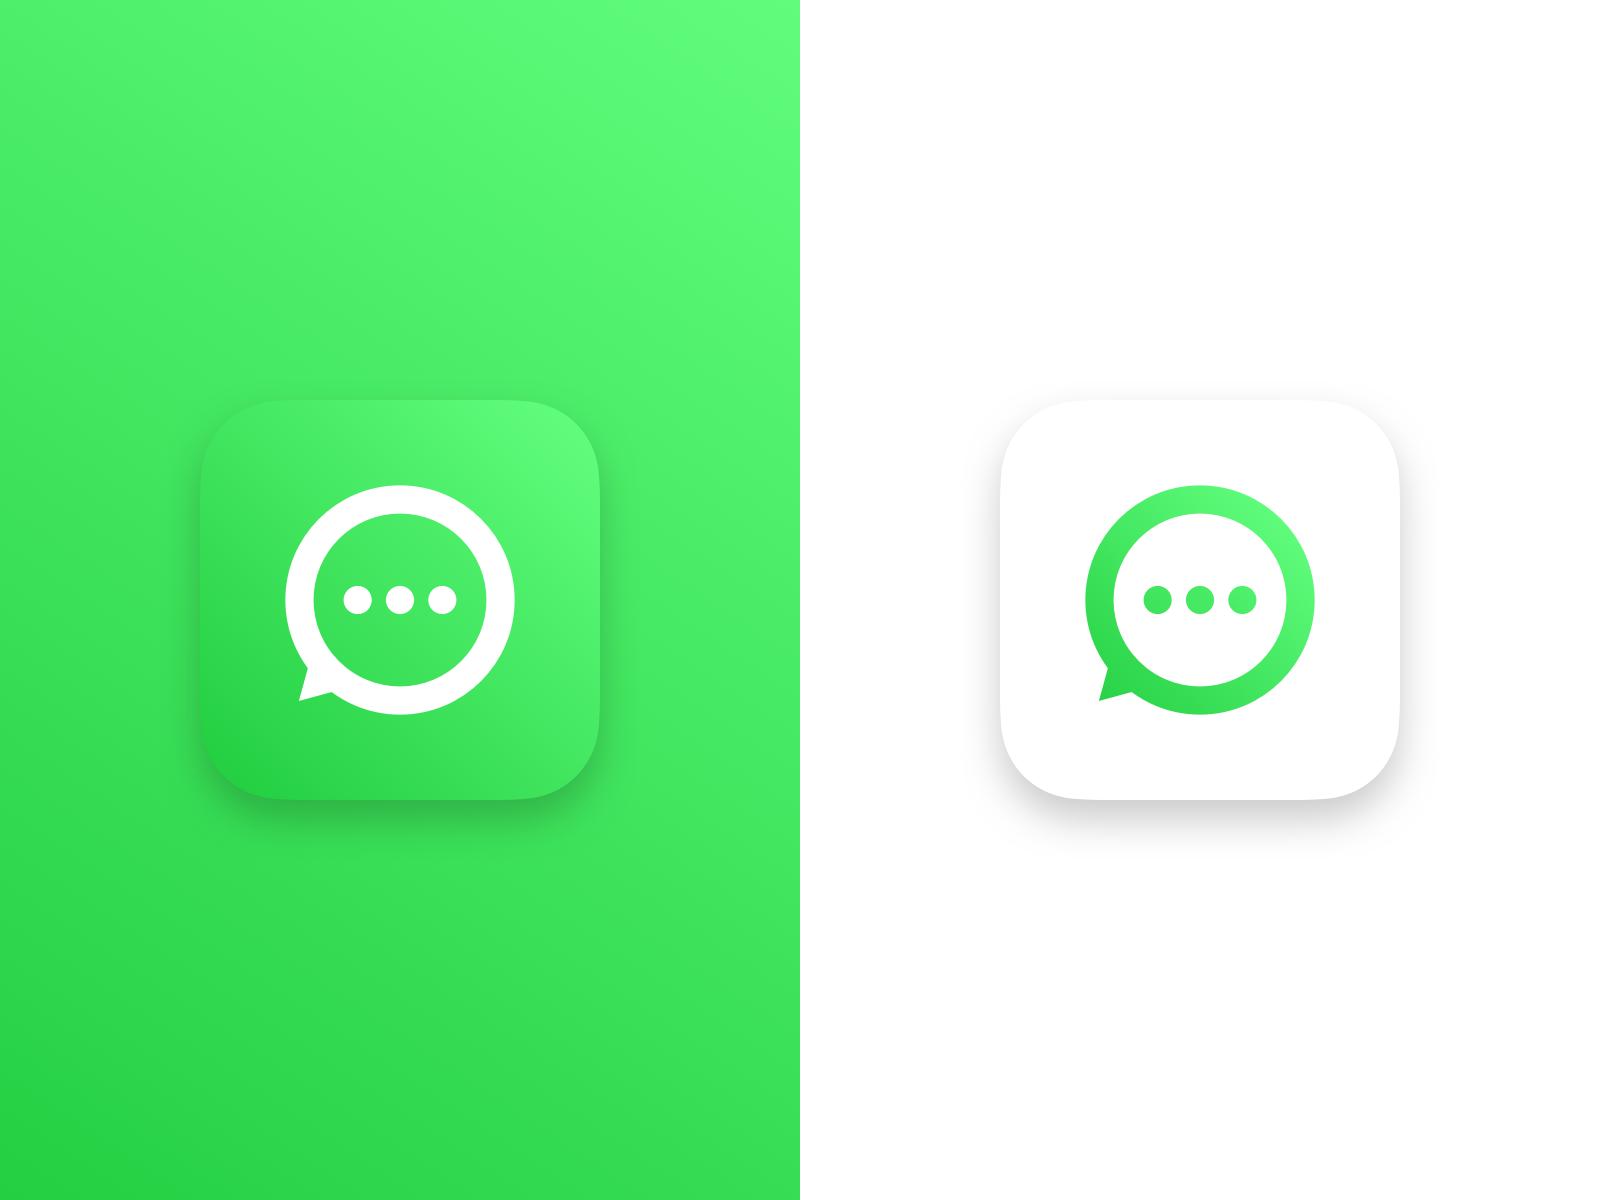 Whatsapp Icon Icon Messaging App Branding